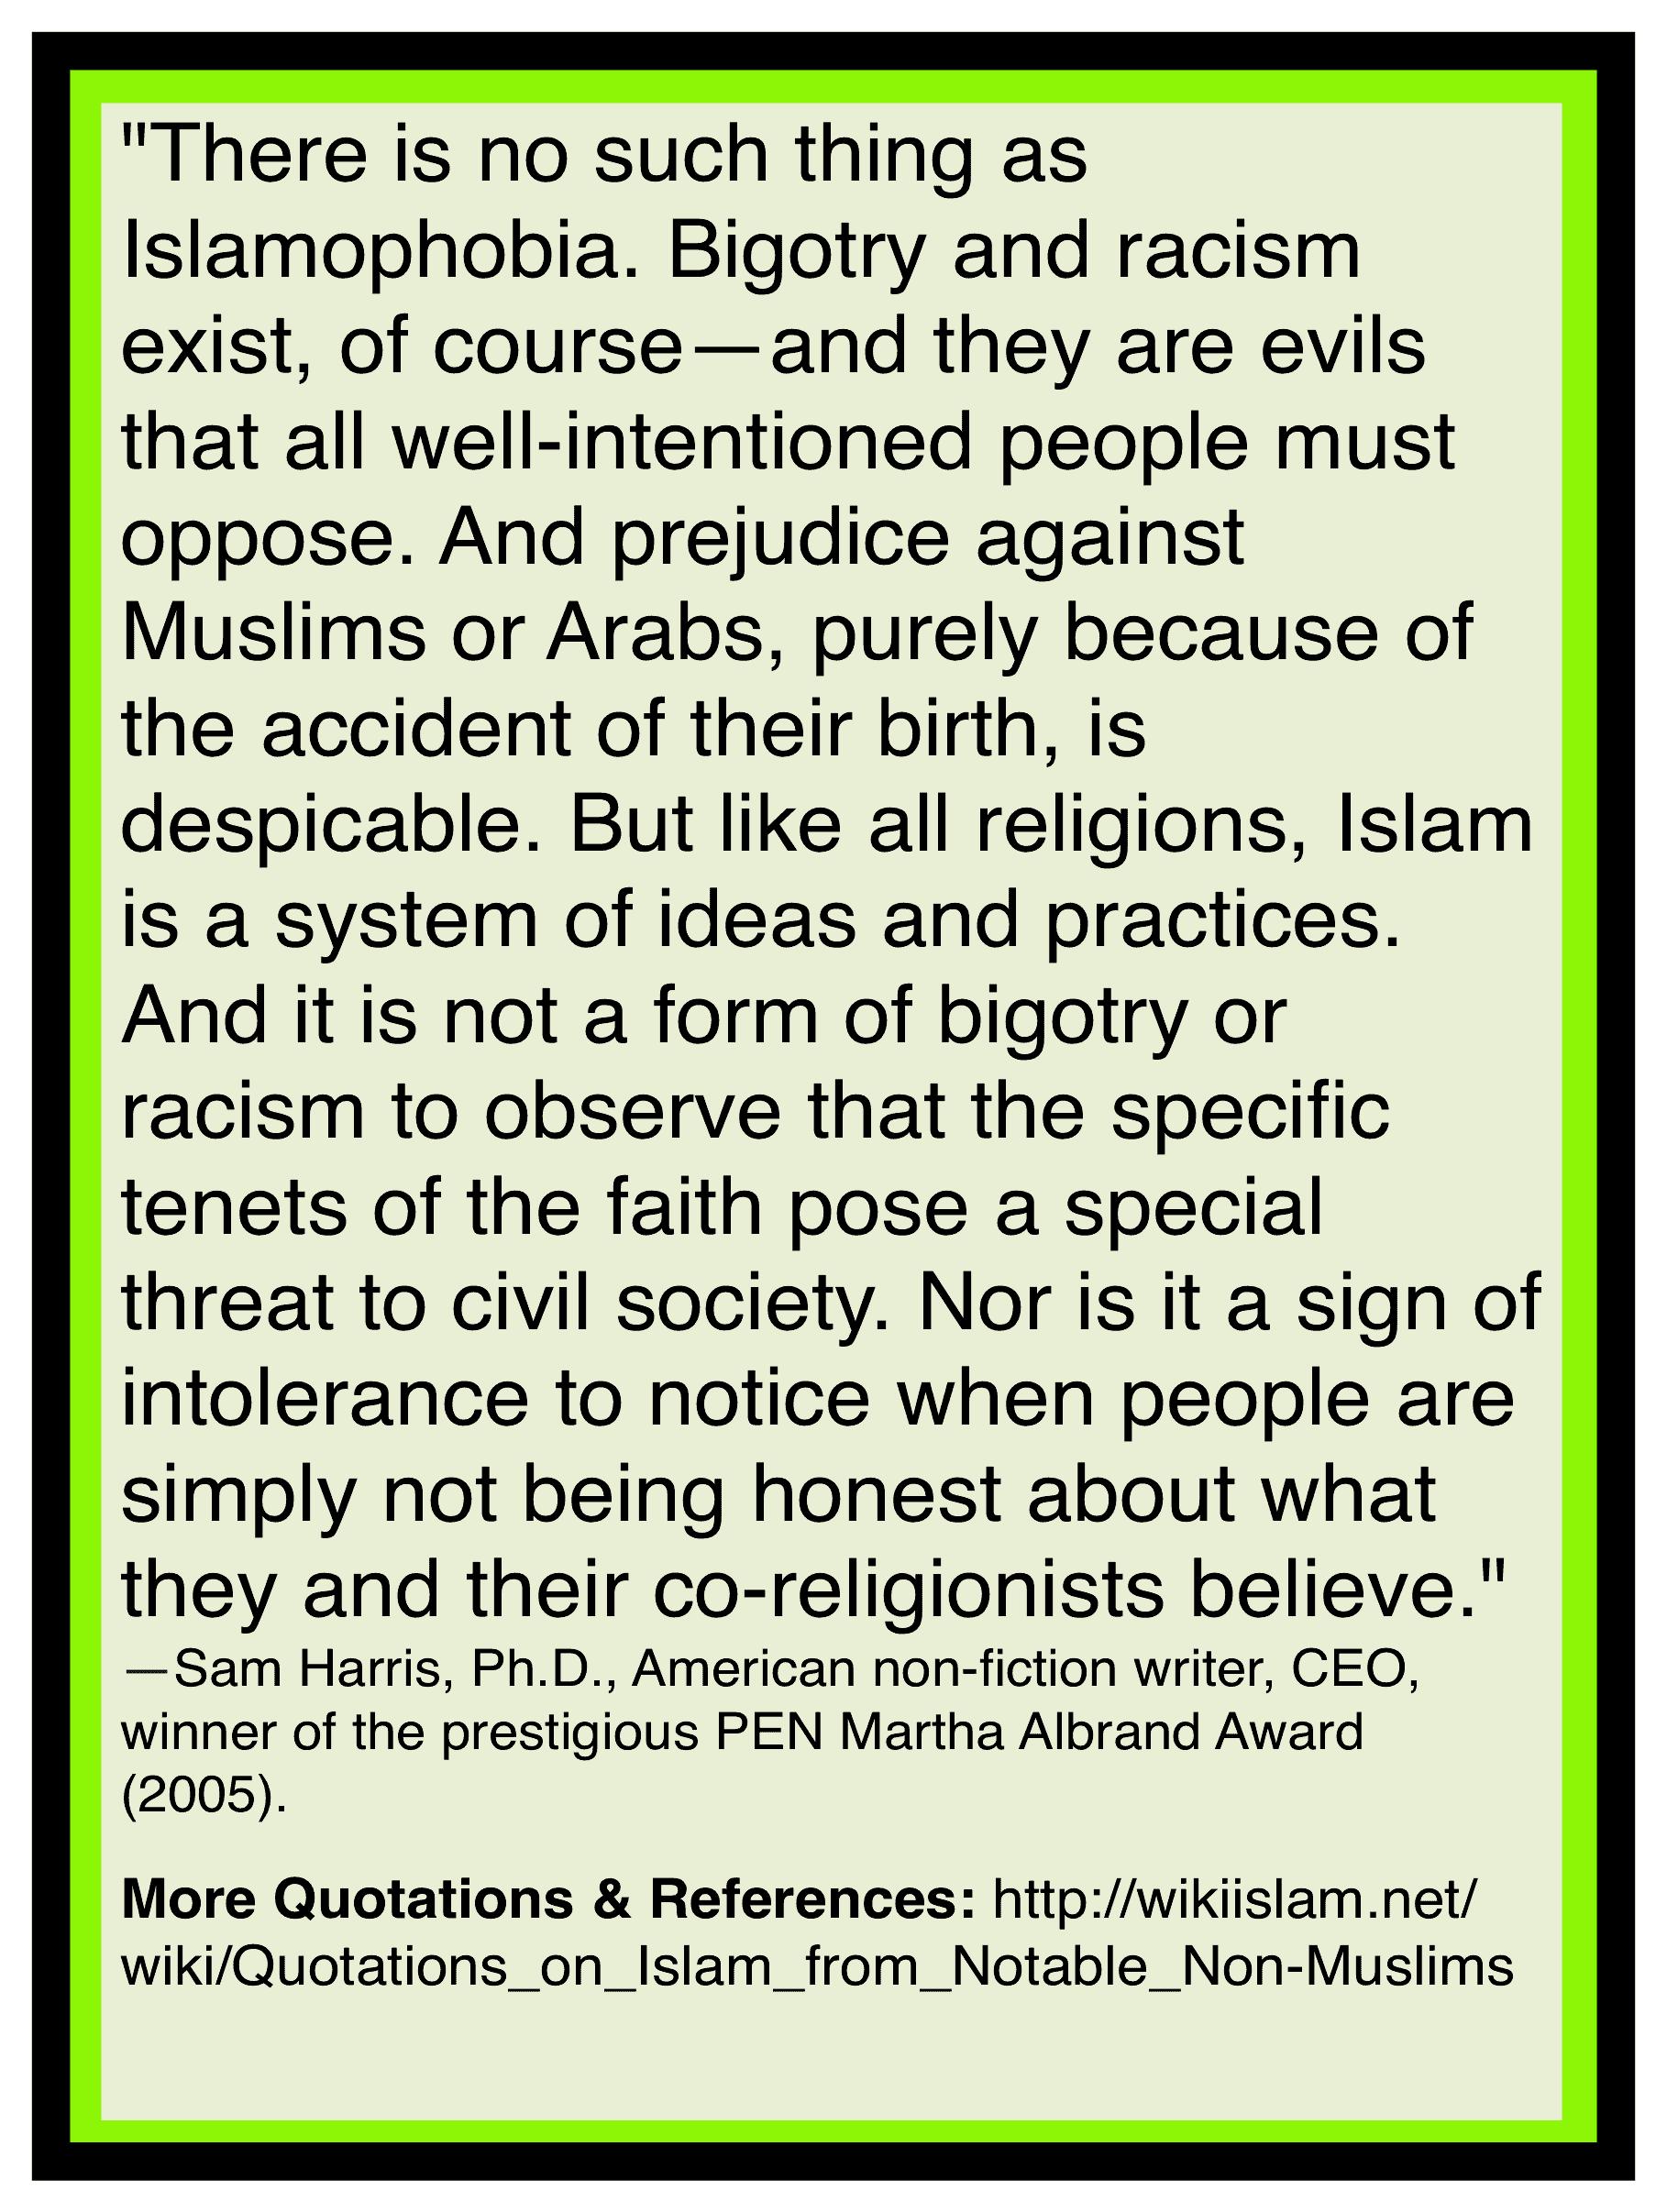 Islamophobia does not exist